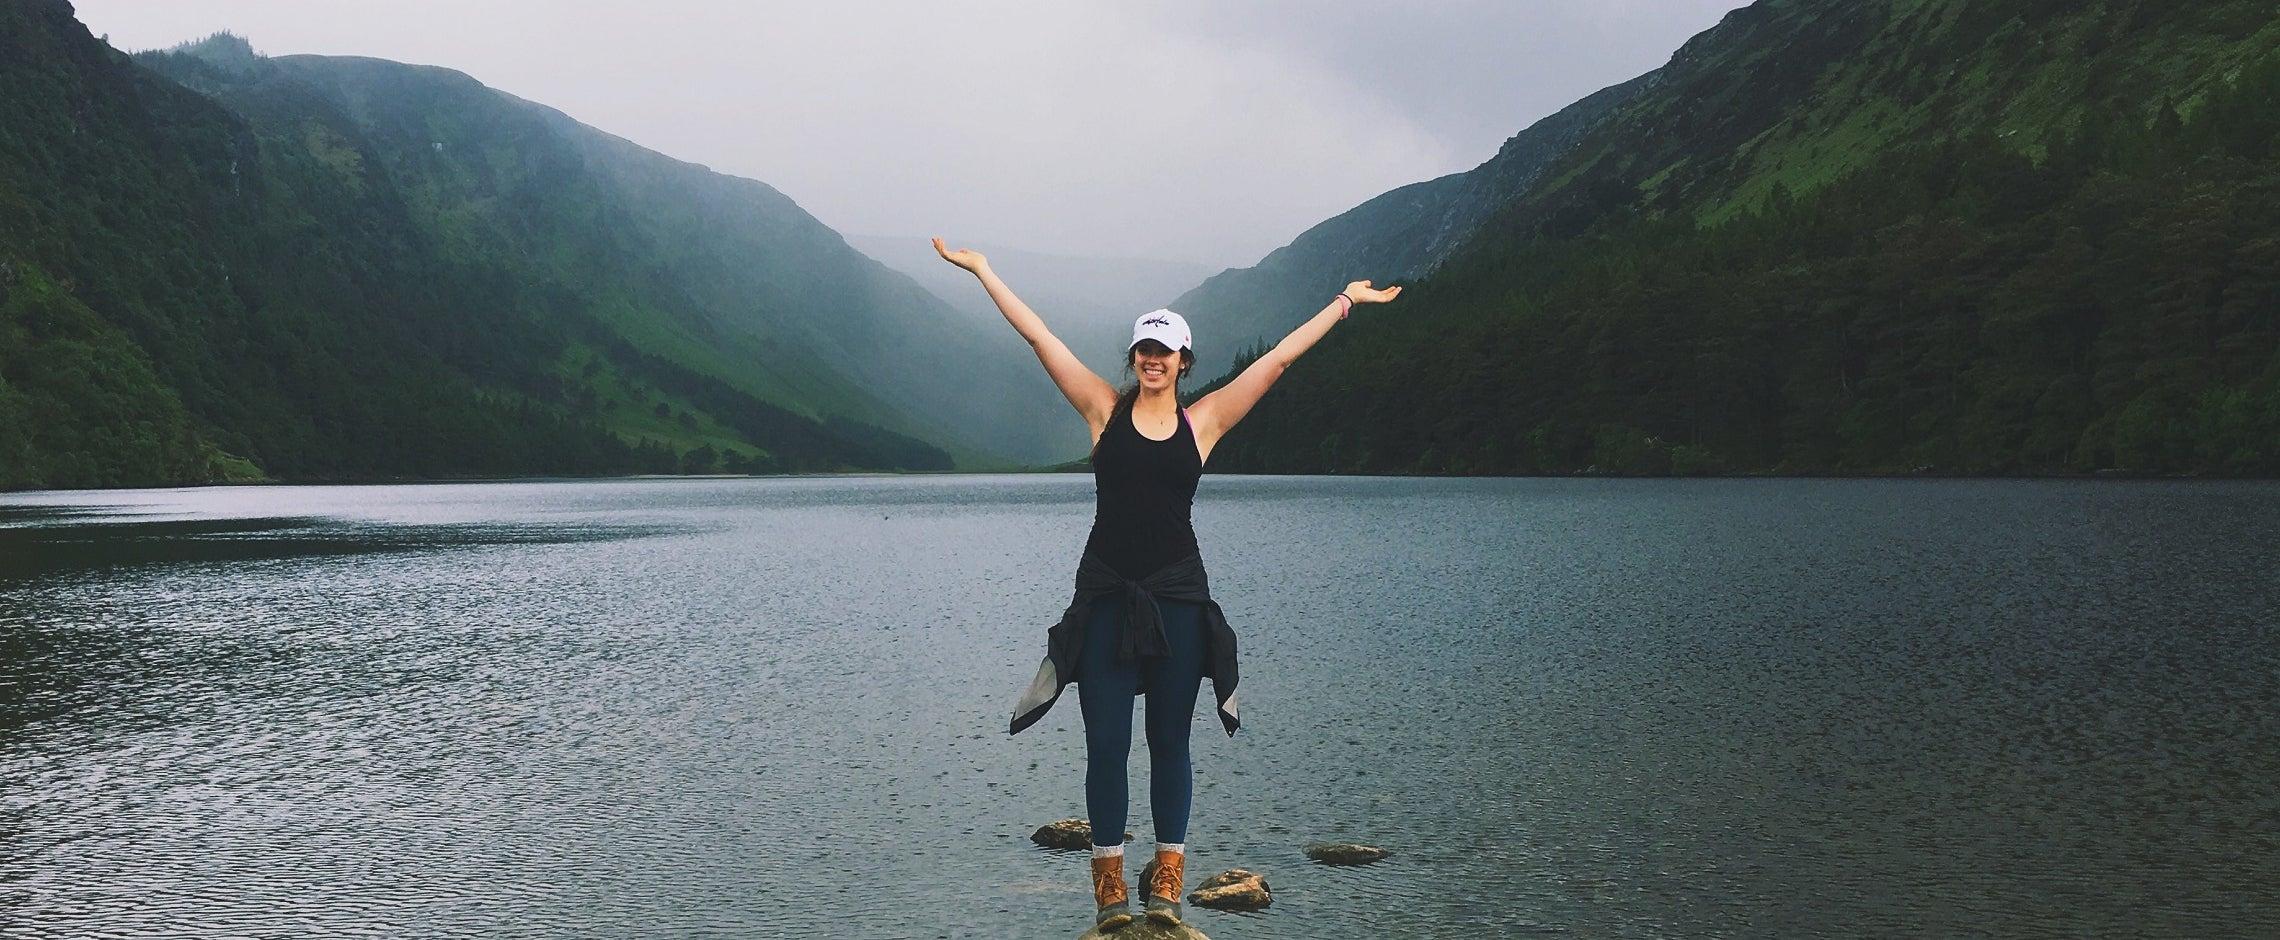 Student in Ireland